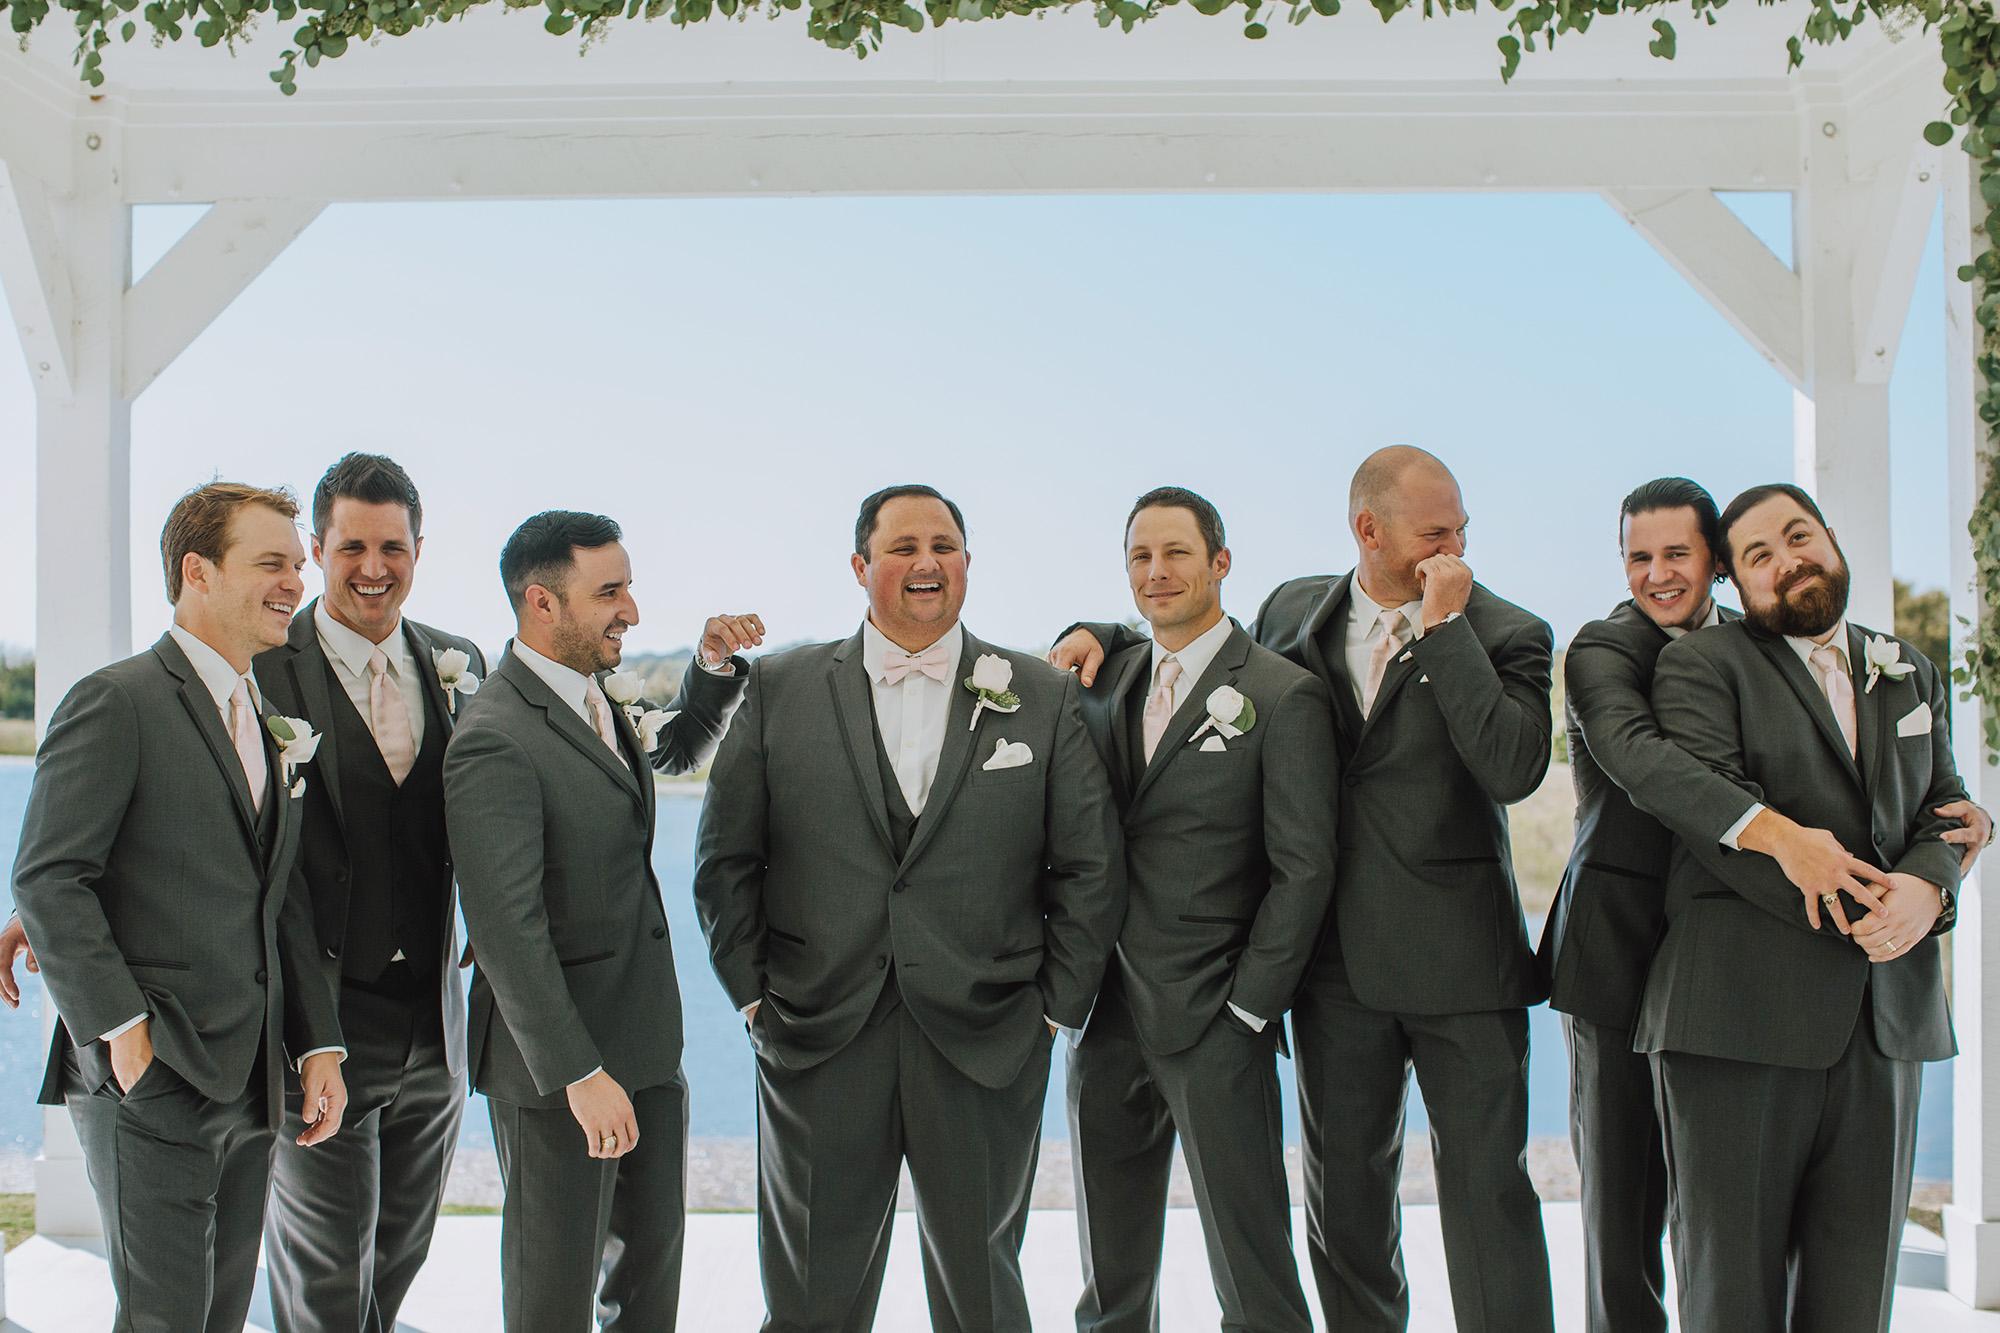 Groomsman Attire - The Grand Ivory Wedding - Leonard, Texas Wedding Venue